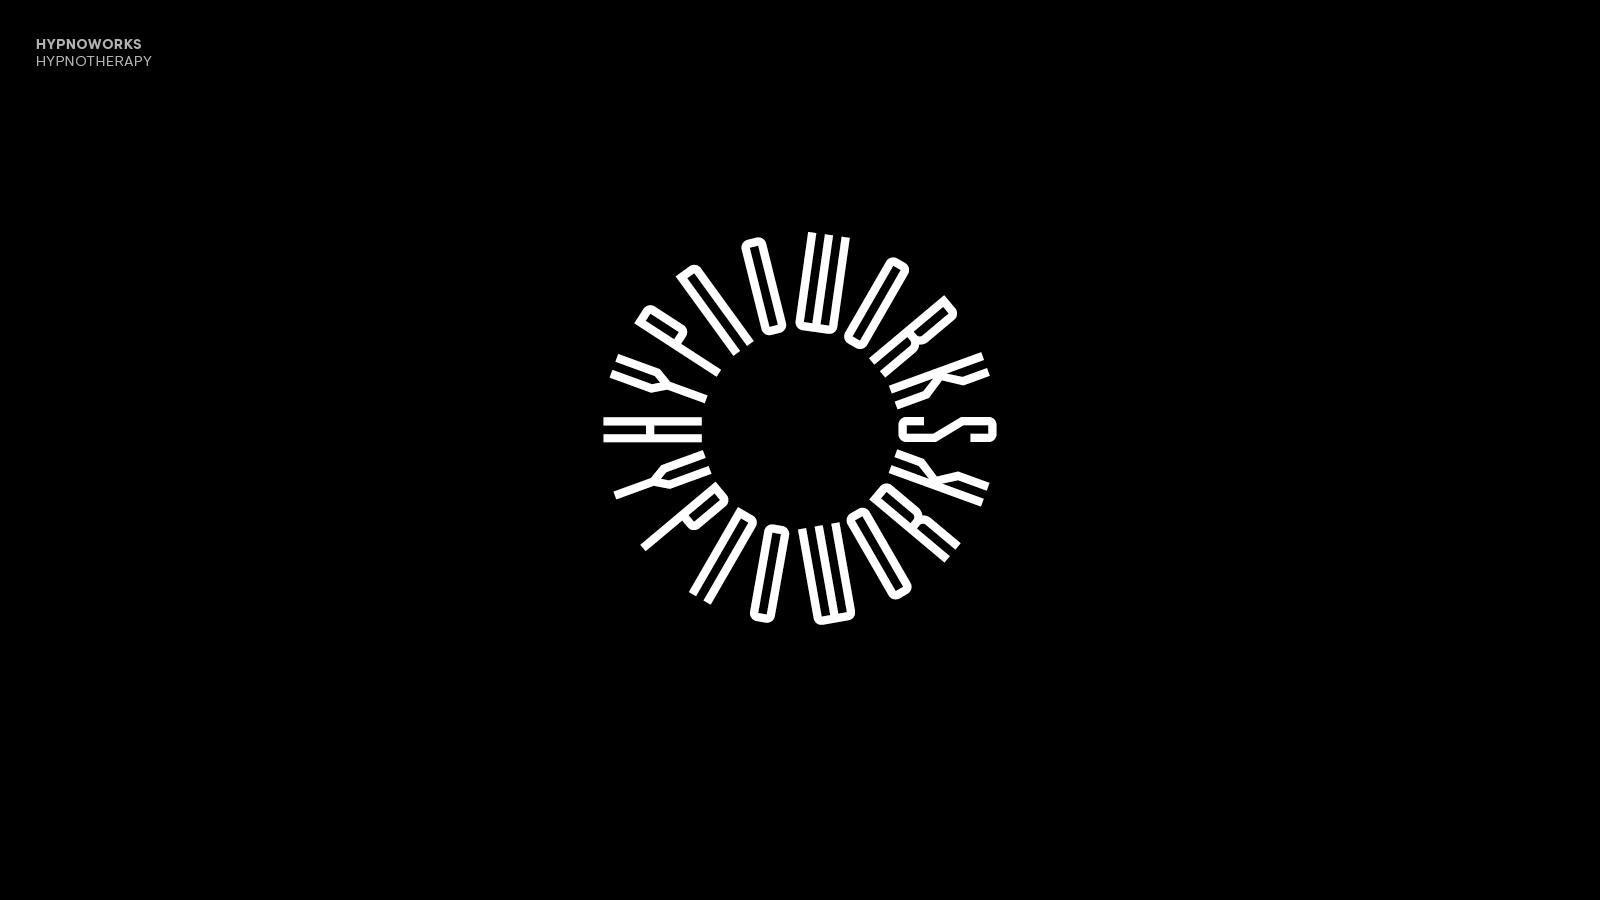 logos-designer-brand-identity-projects-graphics-studio-milton-keynes-london-3